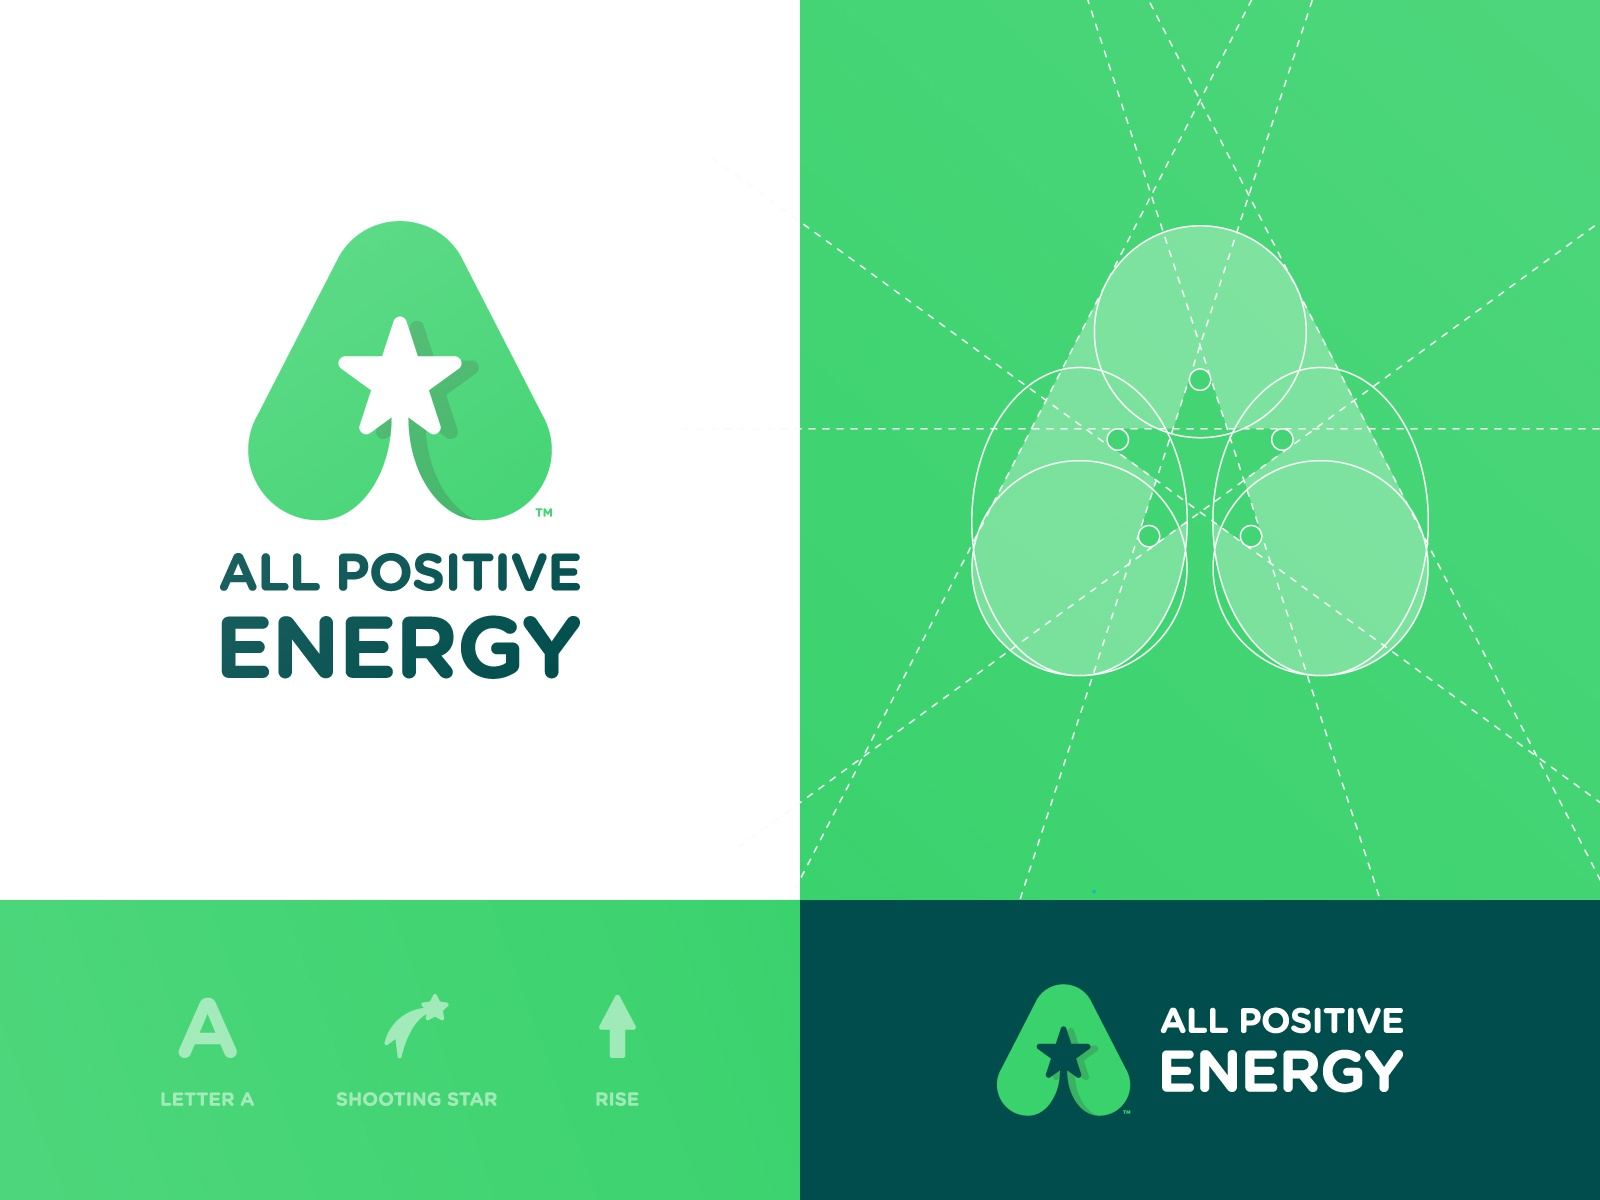 All positive energy drib